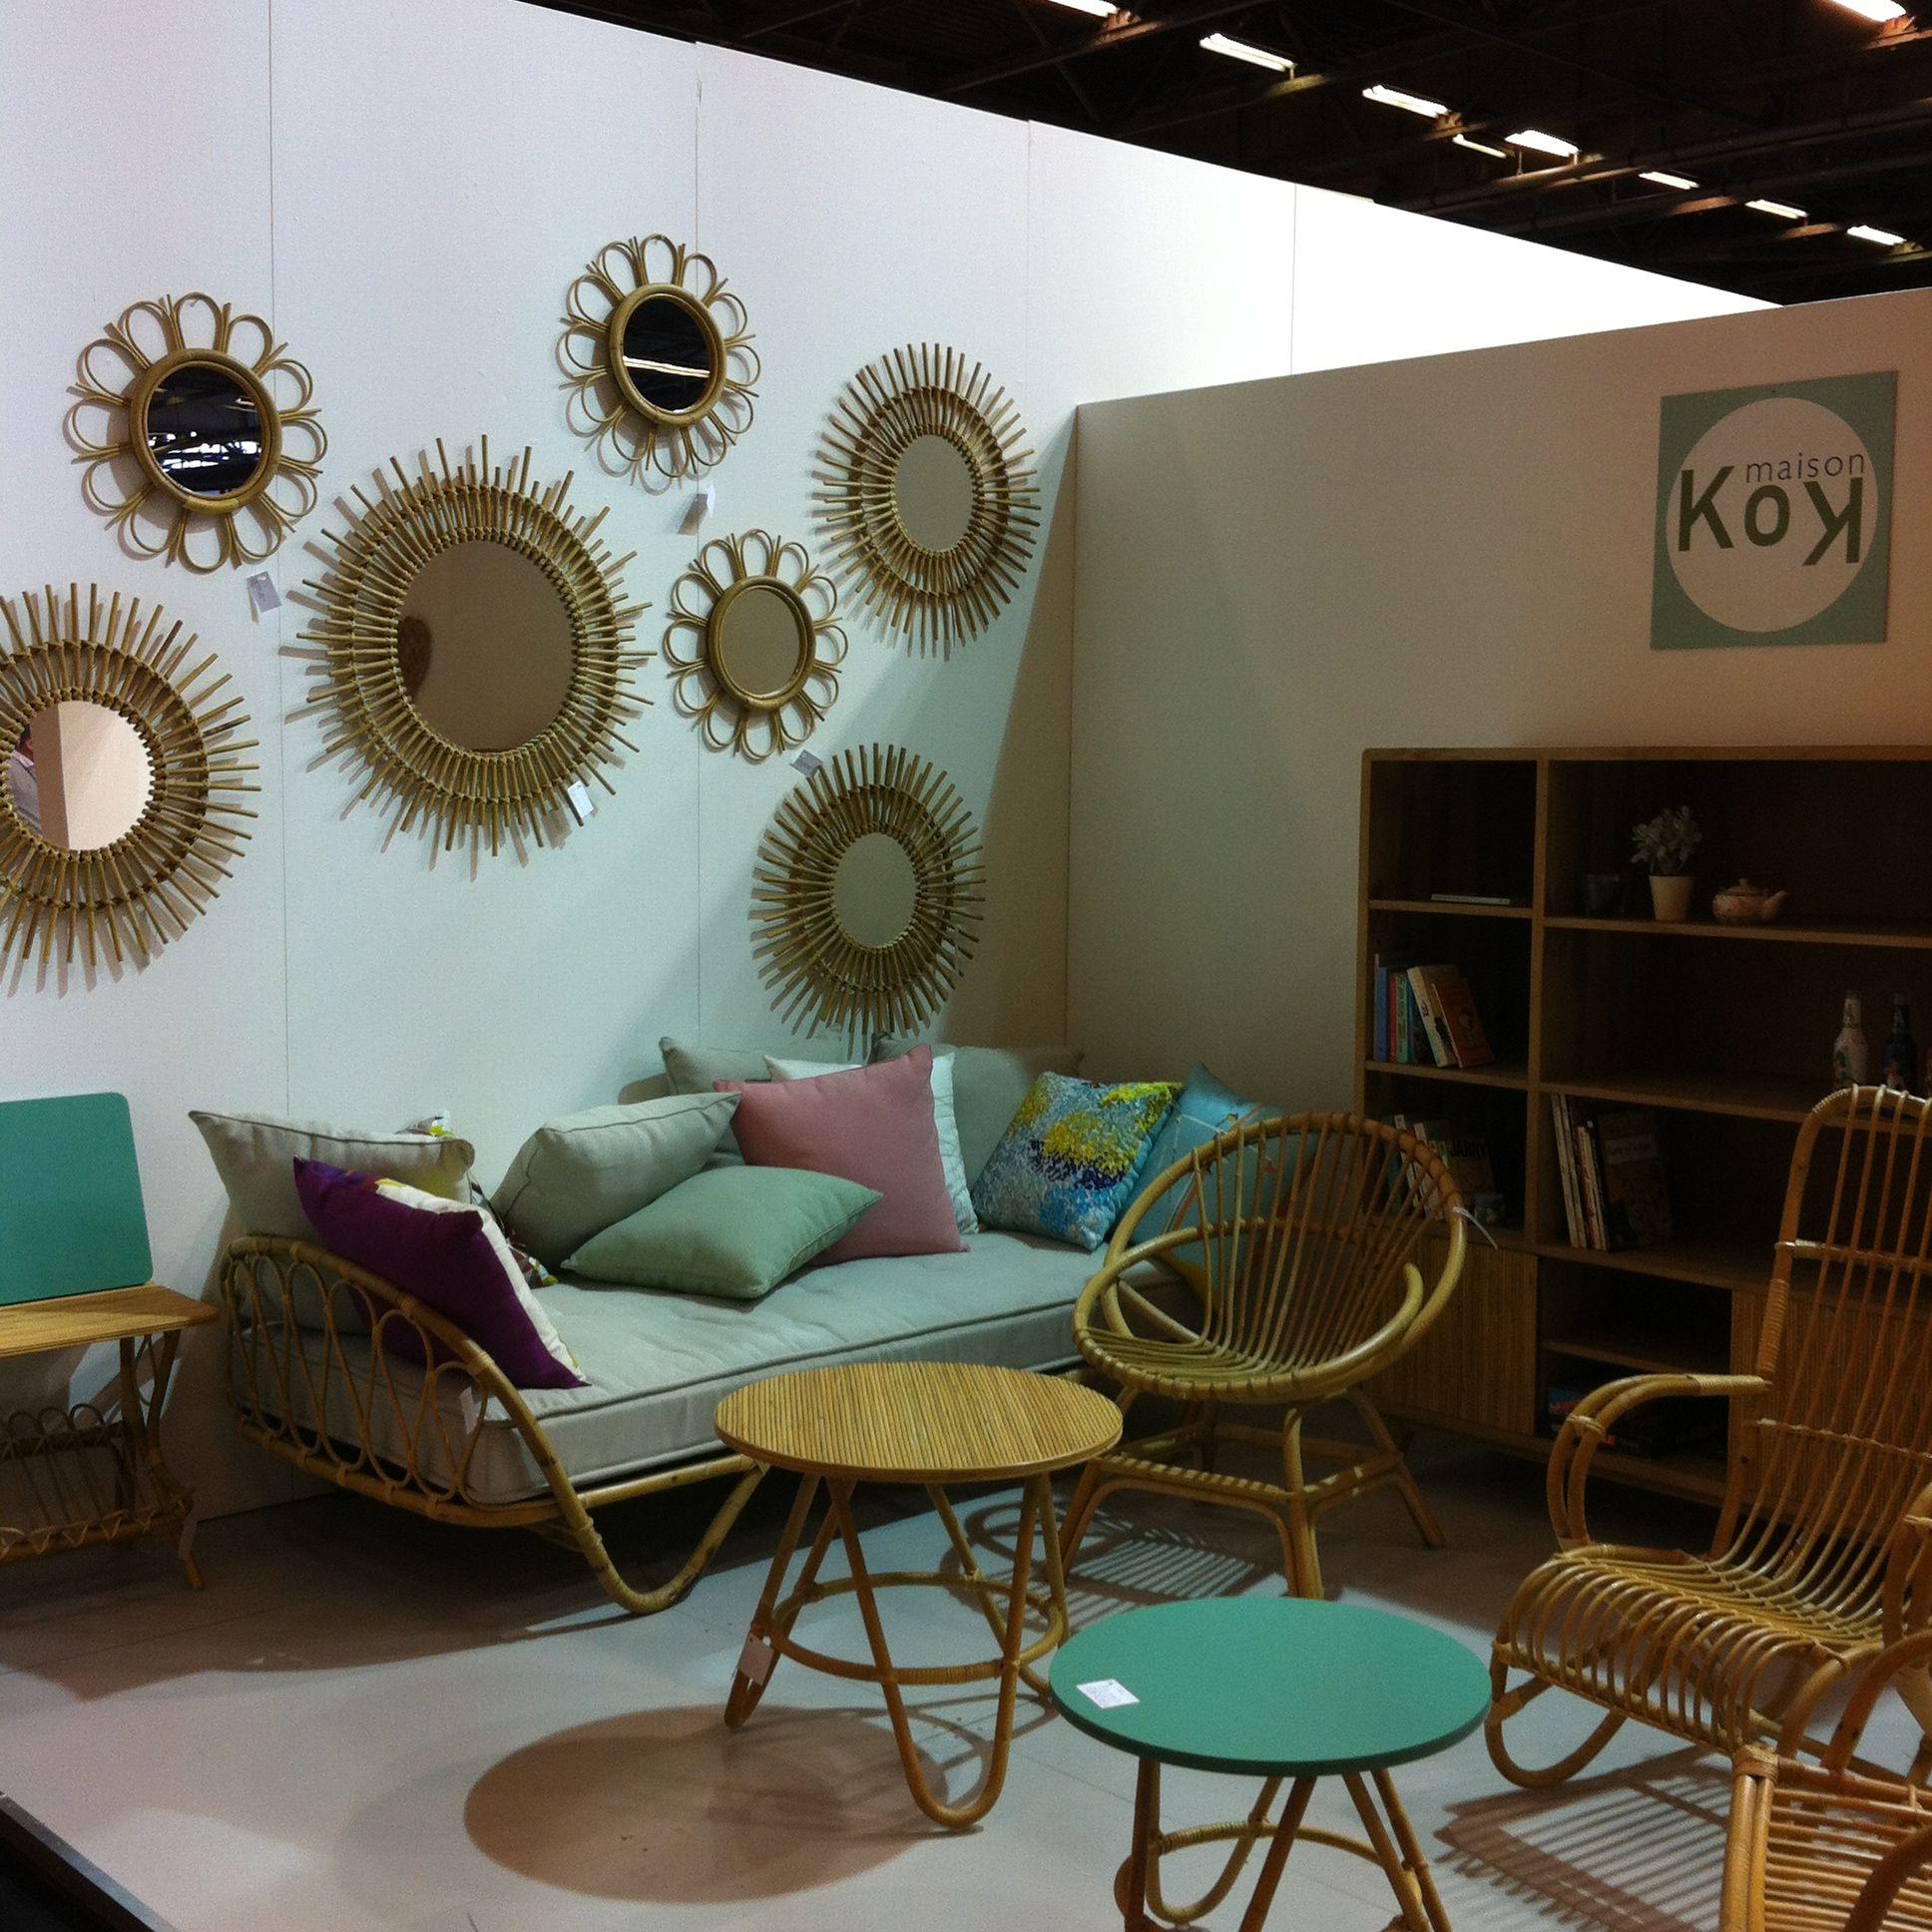 ambiance vintage dans ce salon en rotin par kok kok design rotin deco mo14 maison. Black Bedroom Furniture Sets. Home Design Ideas